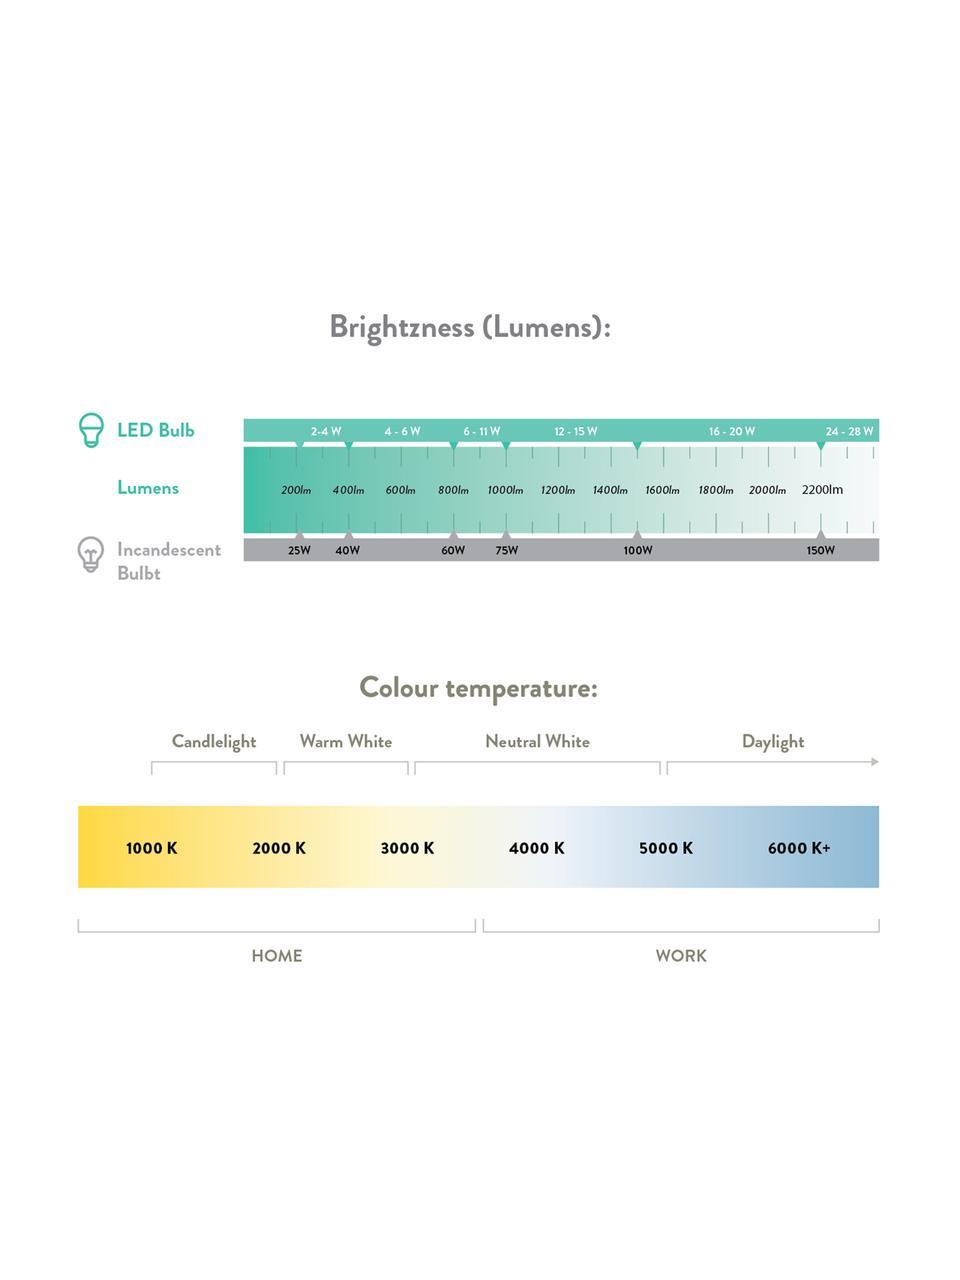 E27 Leuchtmittel, 3.5W, dimmbar, warmweiß, 1 Stück, Leuchtmittelschirm: Glas, Leuchtmittelfassung: Aluminium, Bernsteinfarben, transparent, Ø 10 x H 14 cm